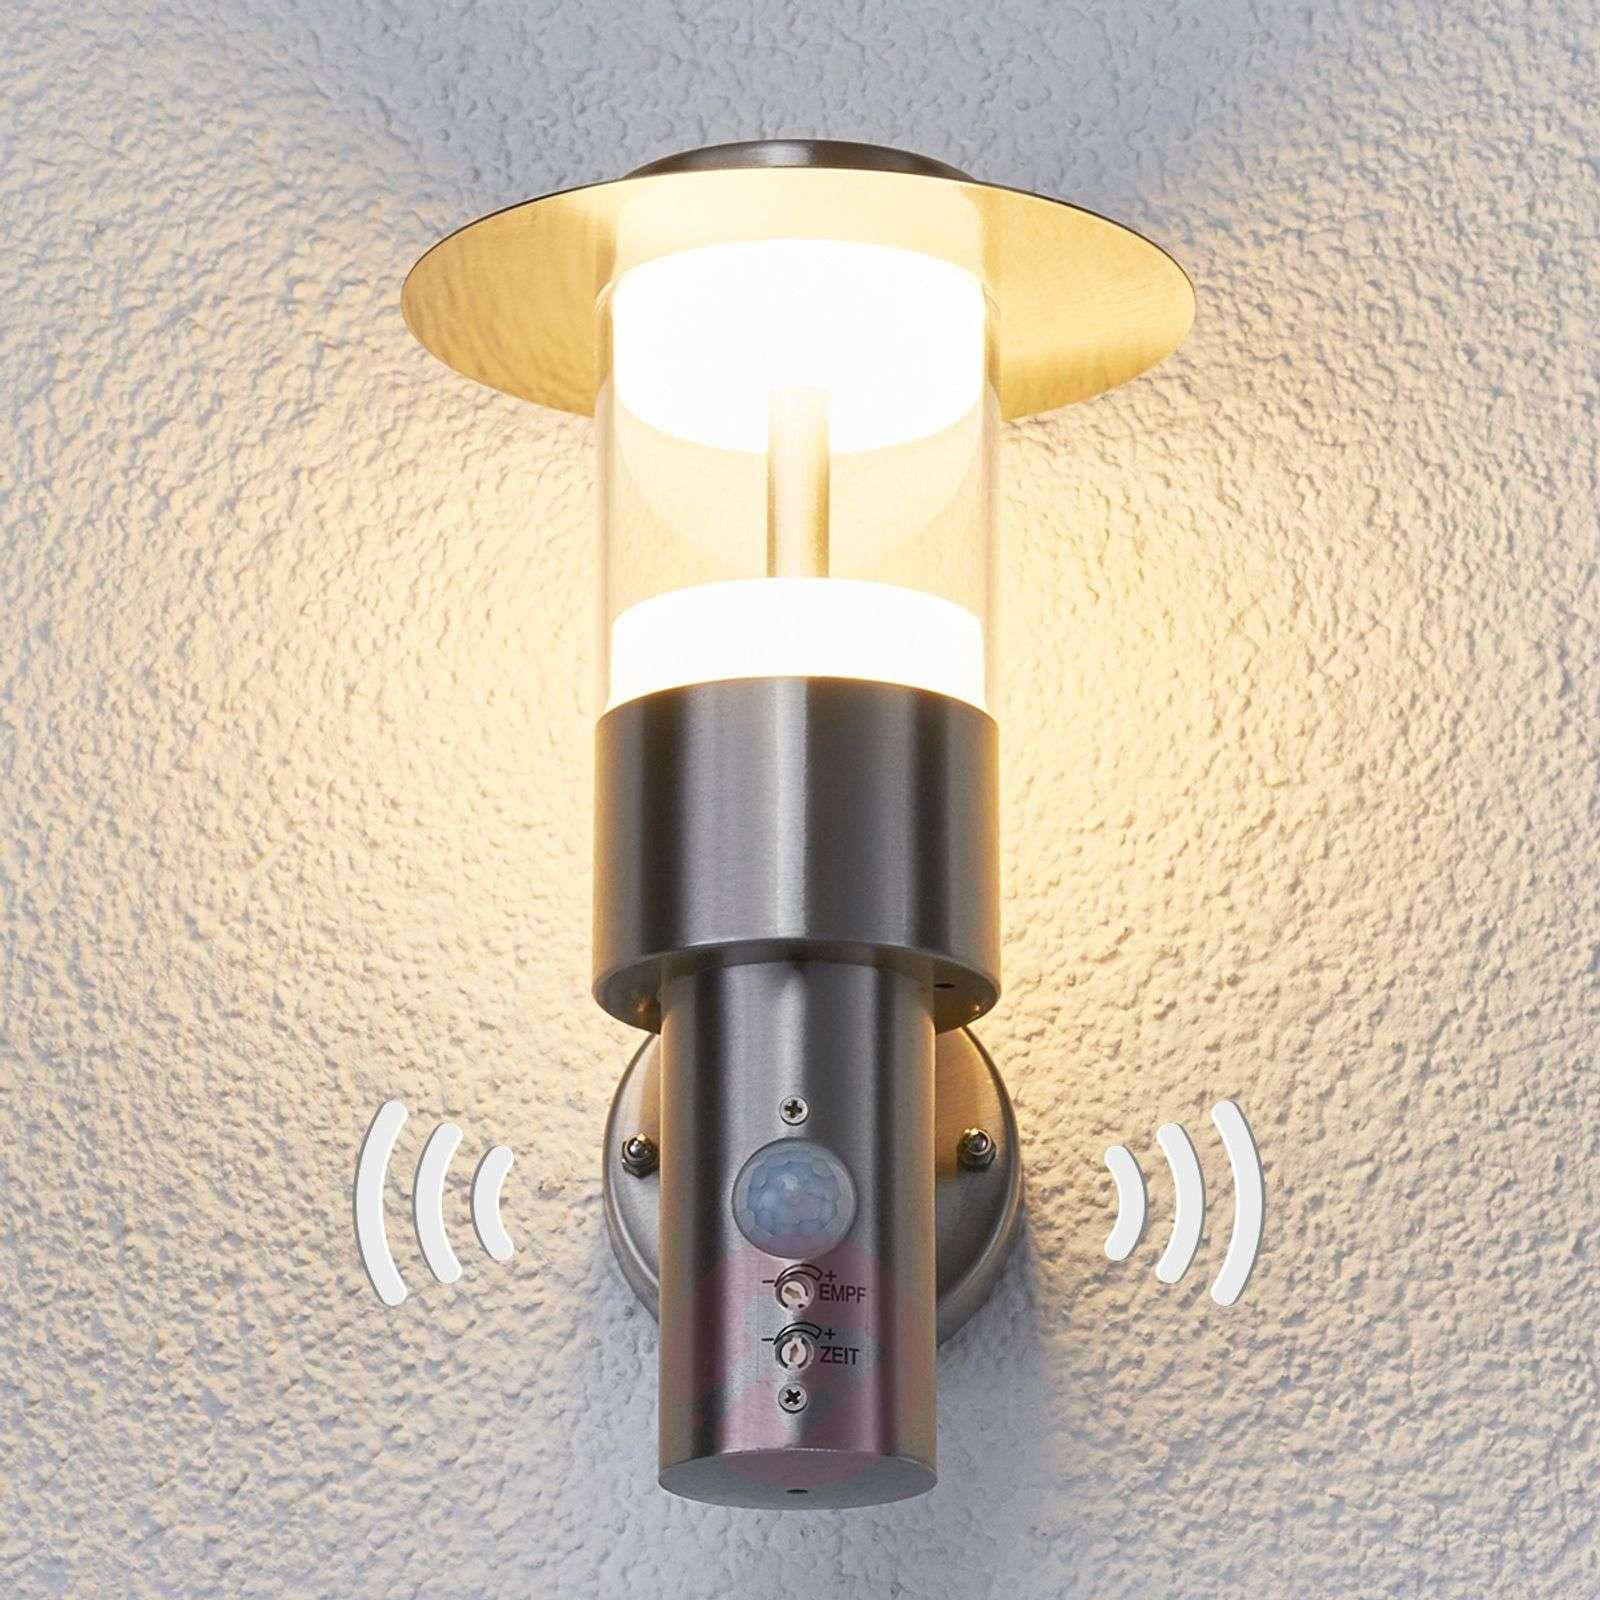 Beautiful ... LED Presence Detector Outdoor Wall Light Anouk 9988030 01 ...